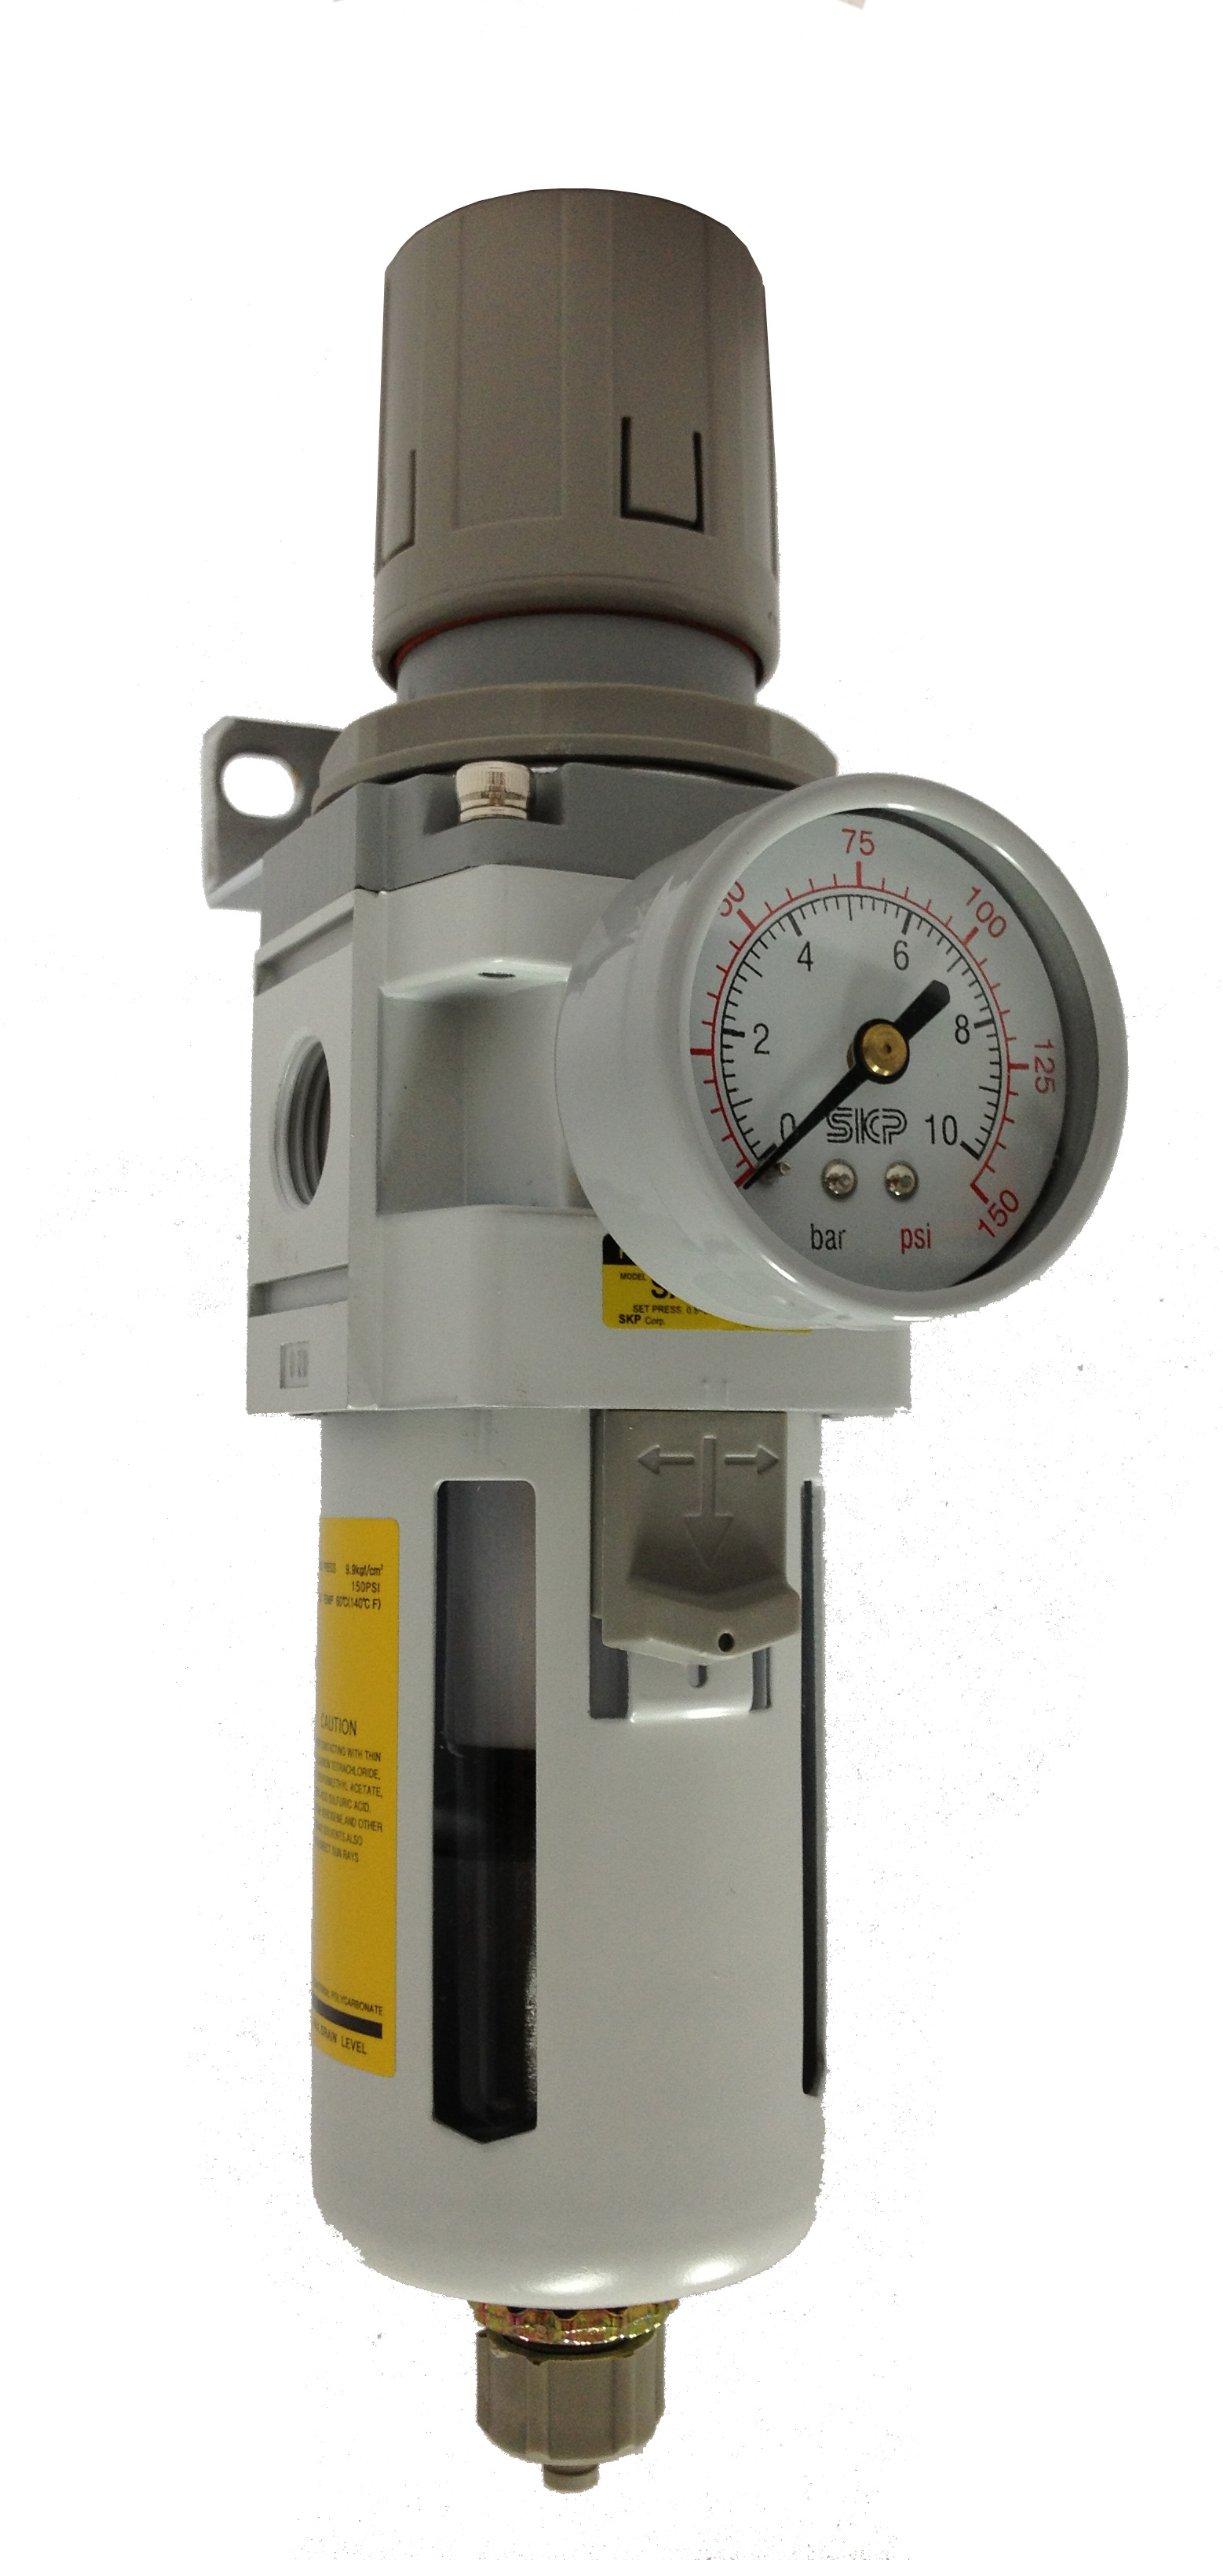 PneumaticPlus SAW3000M-N03BG Air Filter Regulator Combo Piggyback, 3/8'' Pipe Size, NPT-Manual Drain, Poly Bowl with Gauge by PneumaticPlus